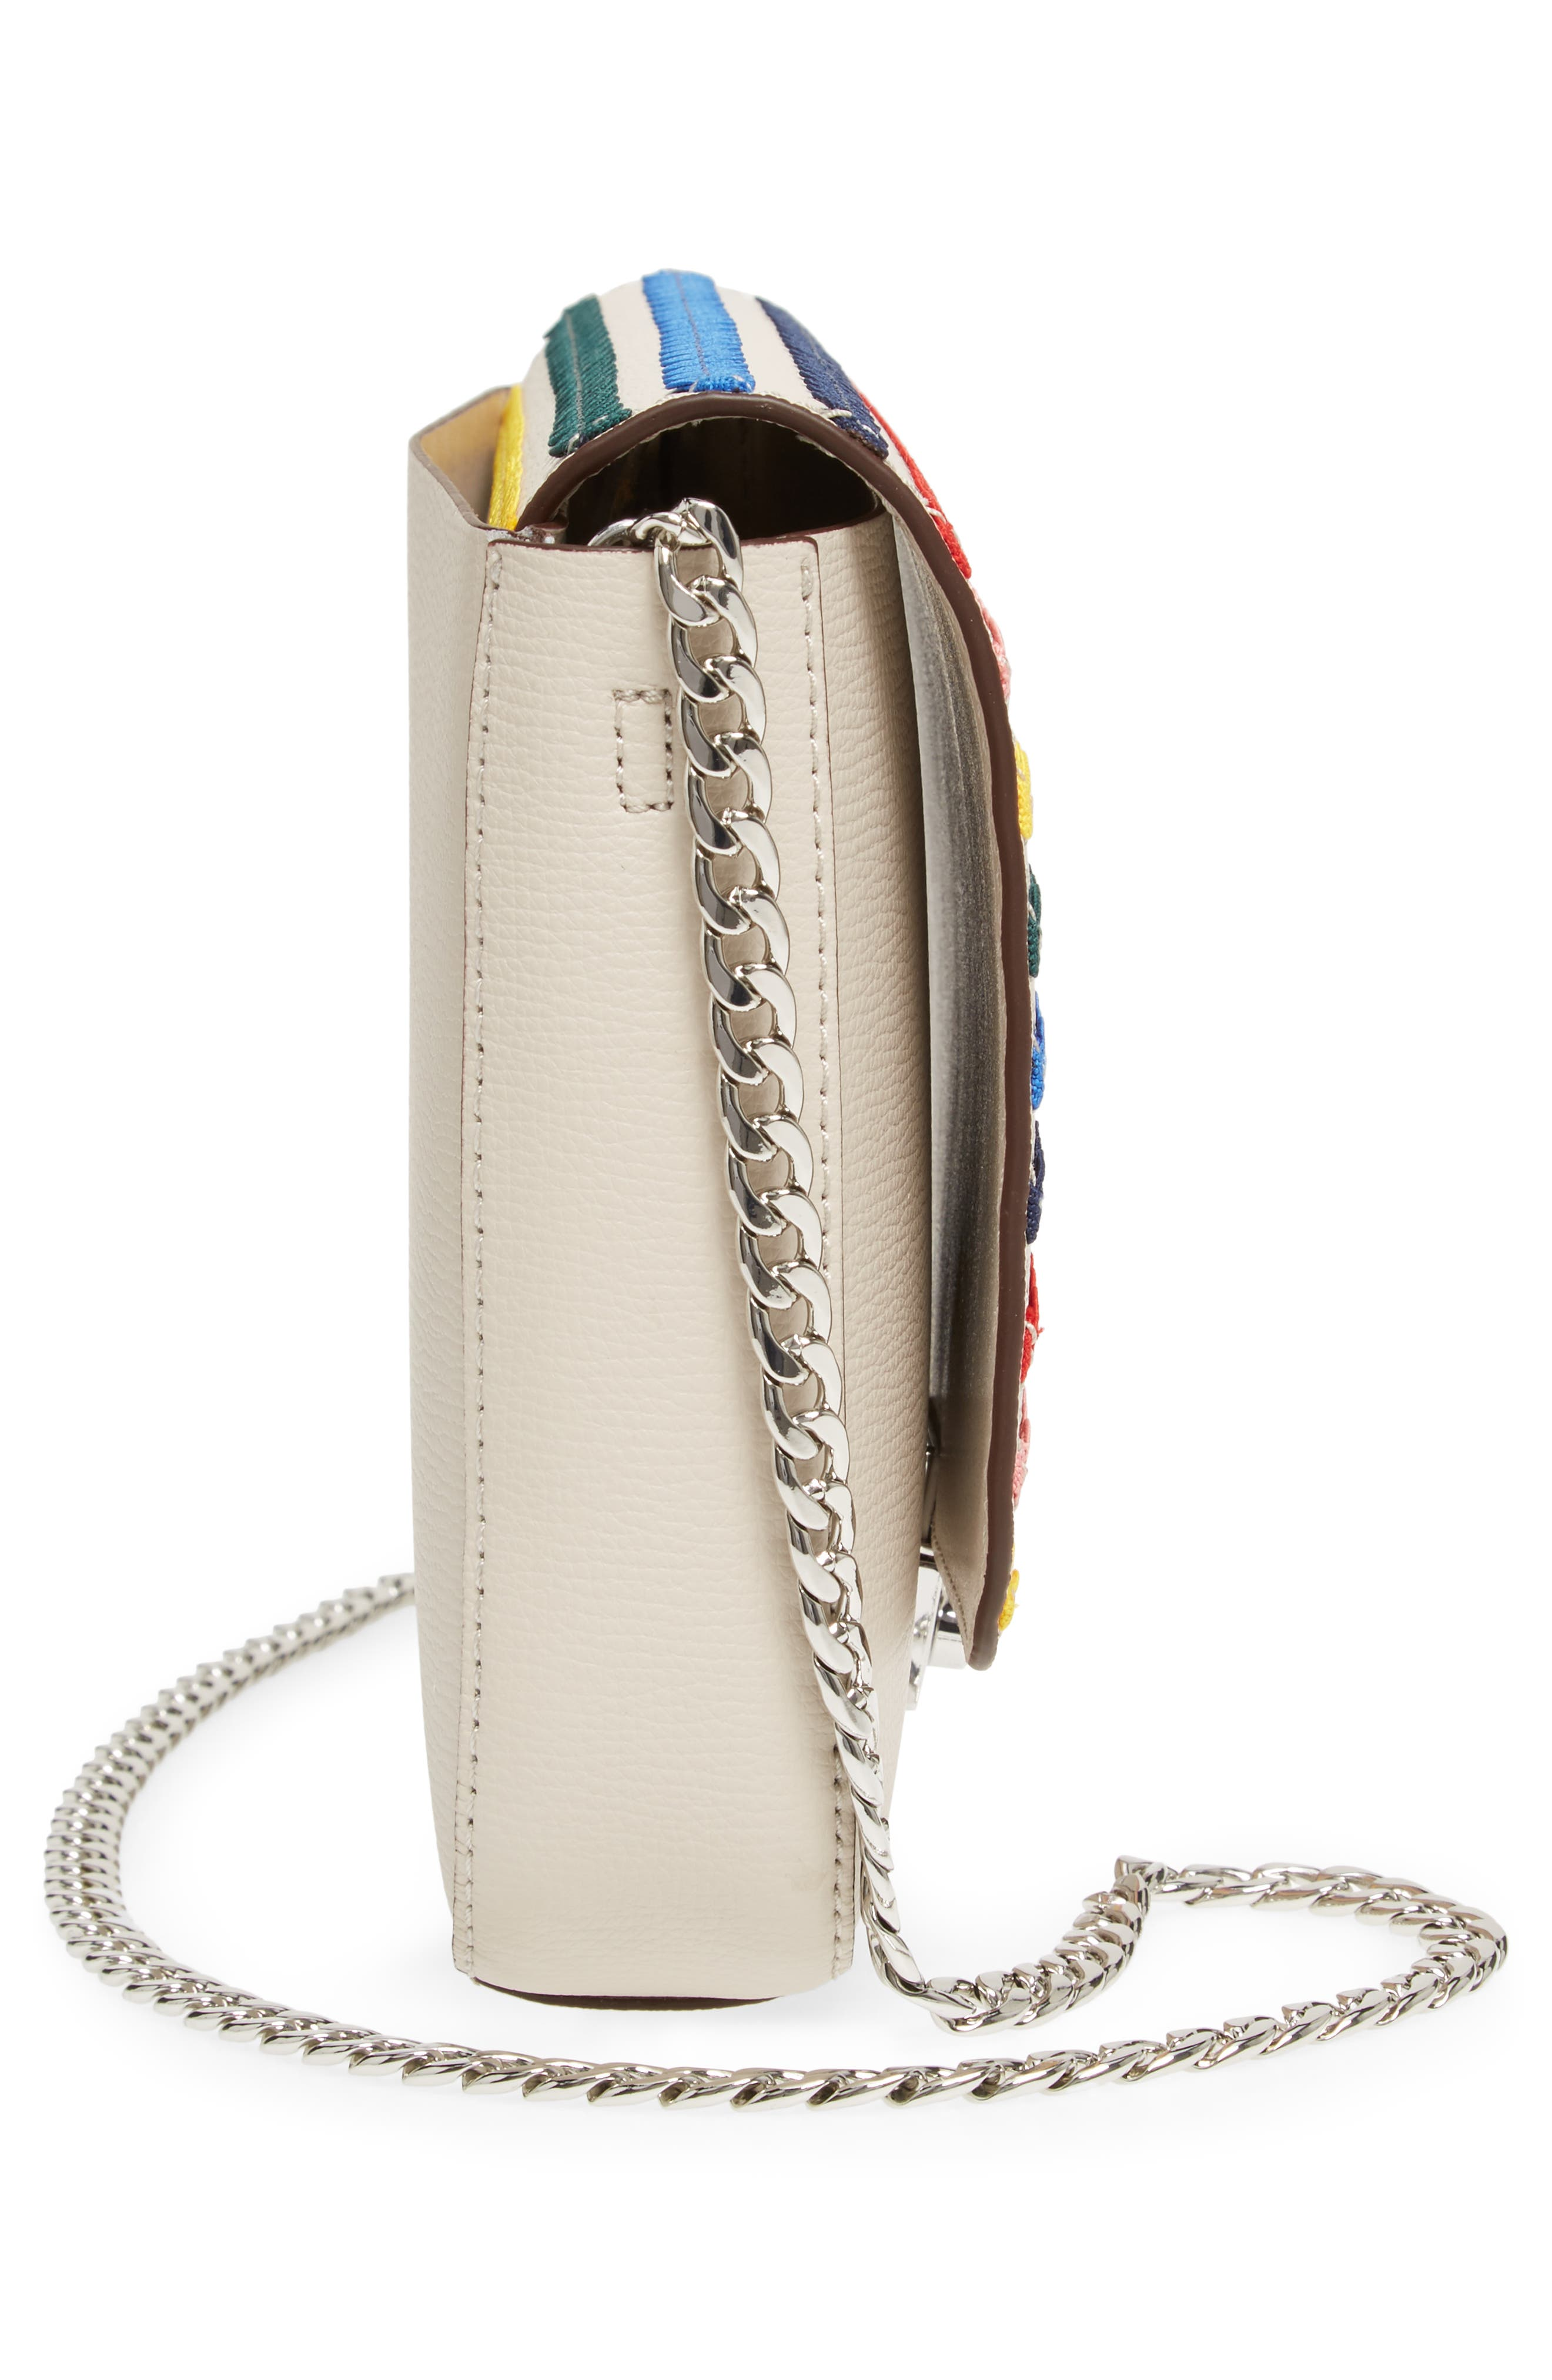 Lock Leather Flap Clutch/Shoulder Bag,                             Alternate thumbnail 5, color,                             Stone/ Rainbow